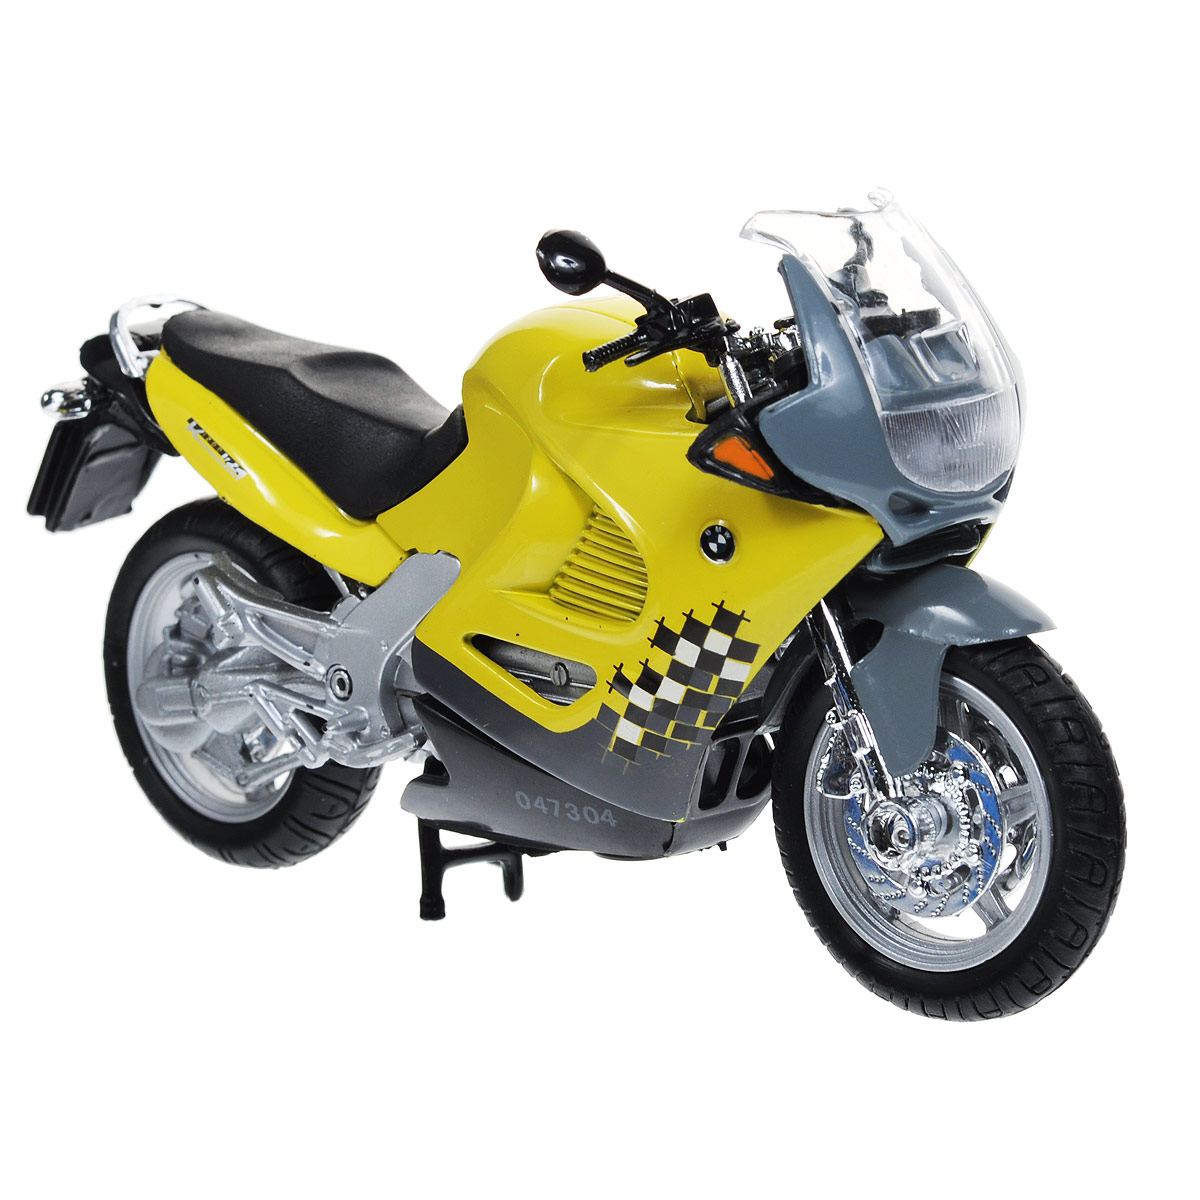 Autotime Коллекционная модель мотоцикла BMW K1200RS, цвет: желтый, серый. Масштаб 1/18 motormax коллекционная модель мотоцикла kawasaki vulcan цвет синий серебристый масштаб 1 18